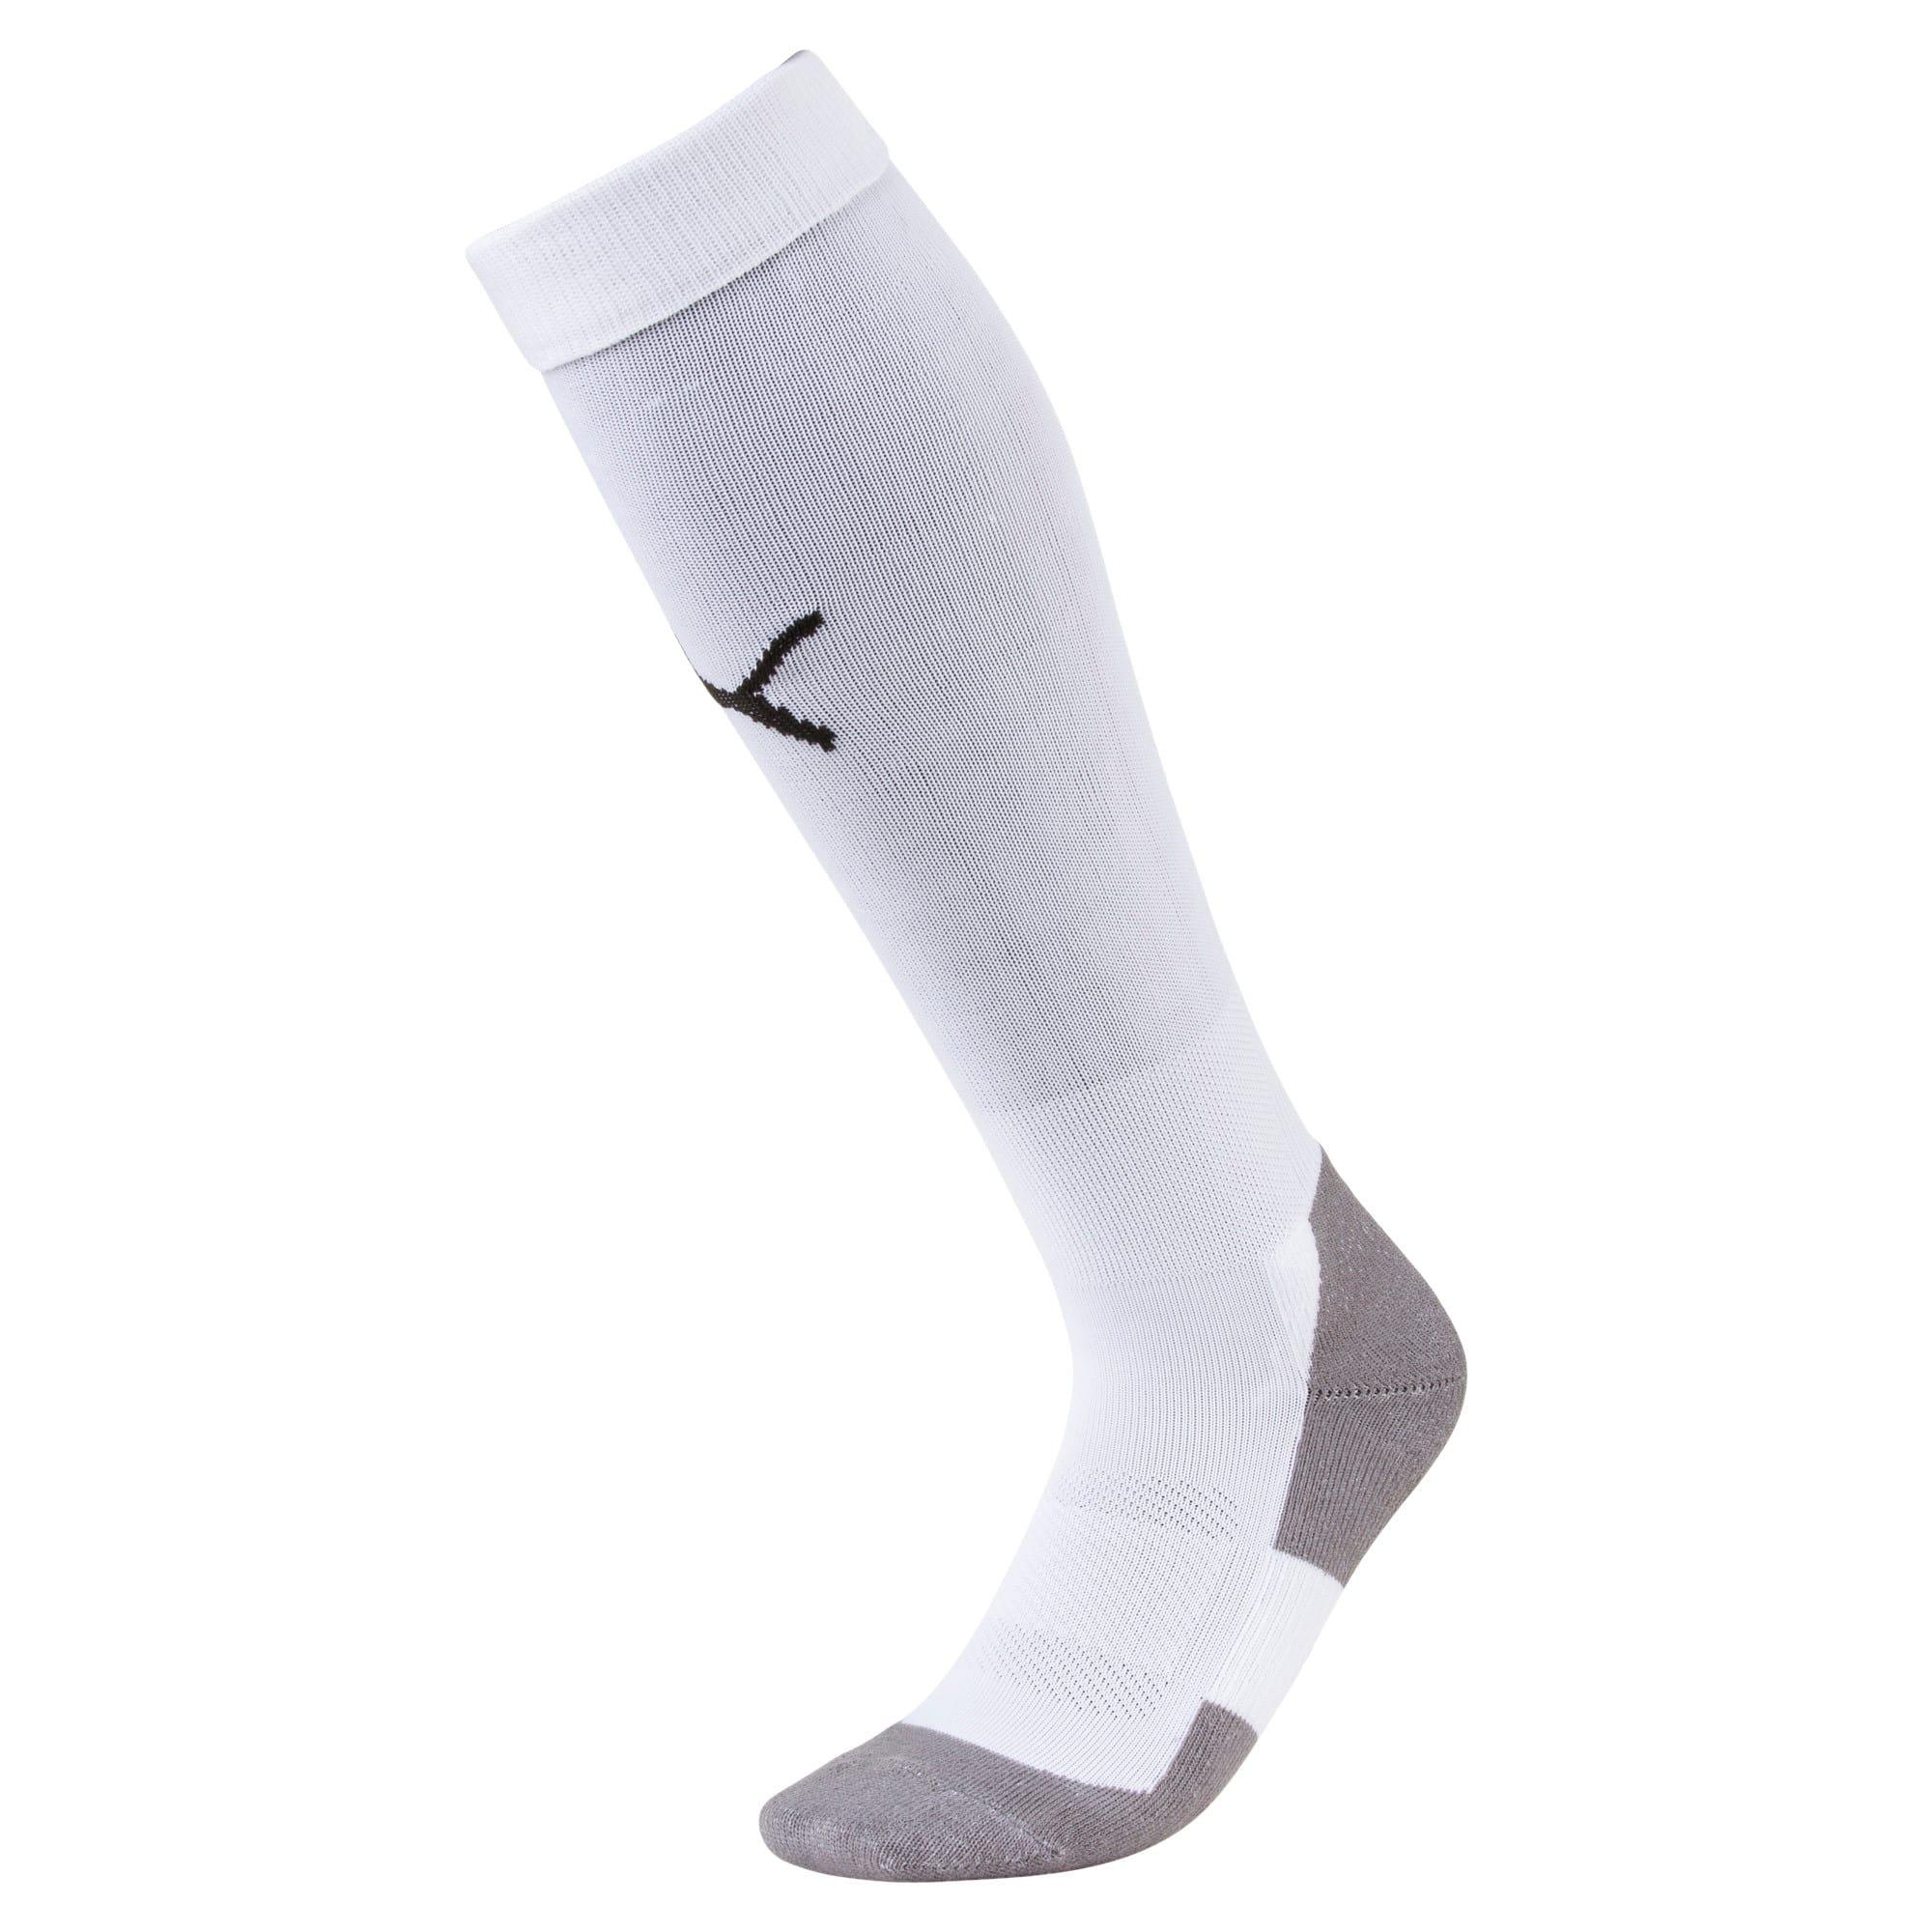 Thumbnail 1 of Fußball Herren LIGA Core Socken, Puma White-Puma Black, medium